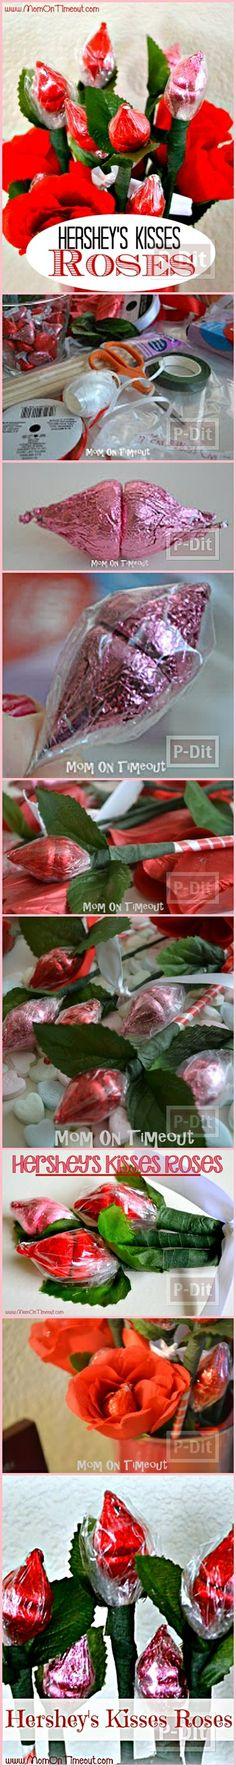 Hershey's Roses